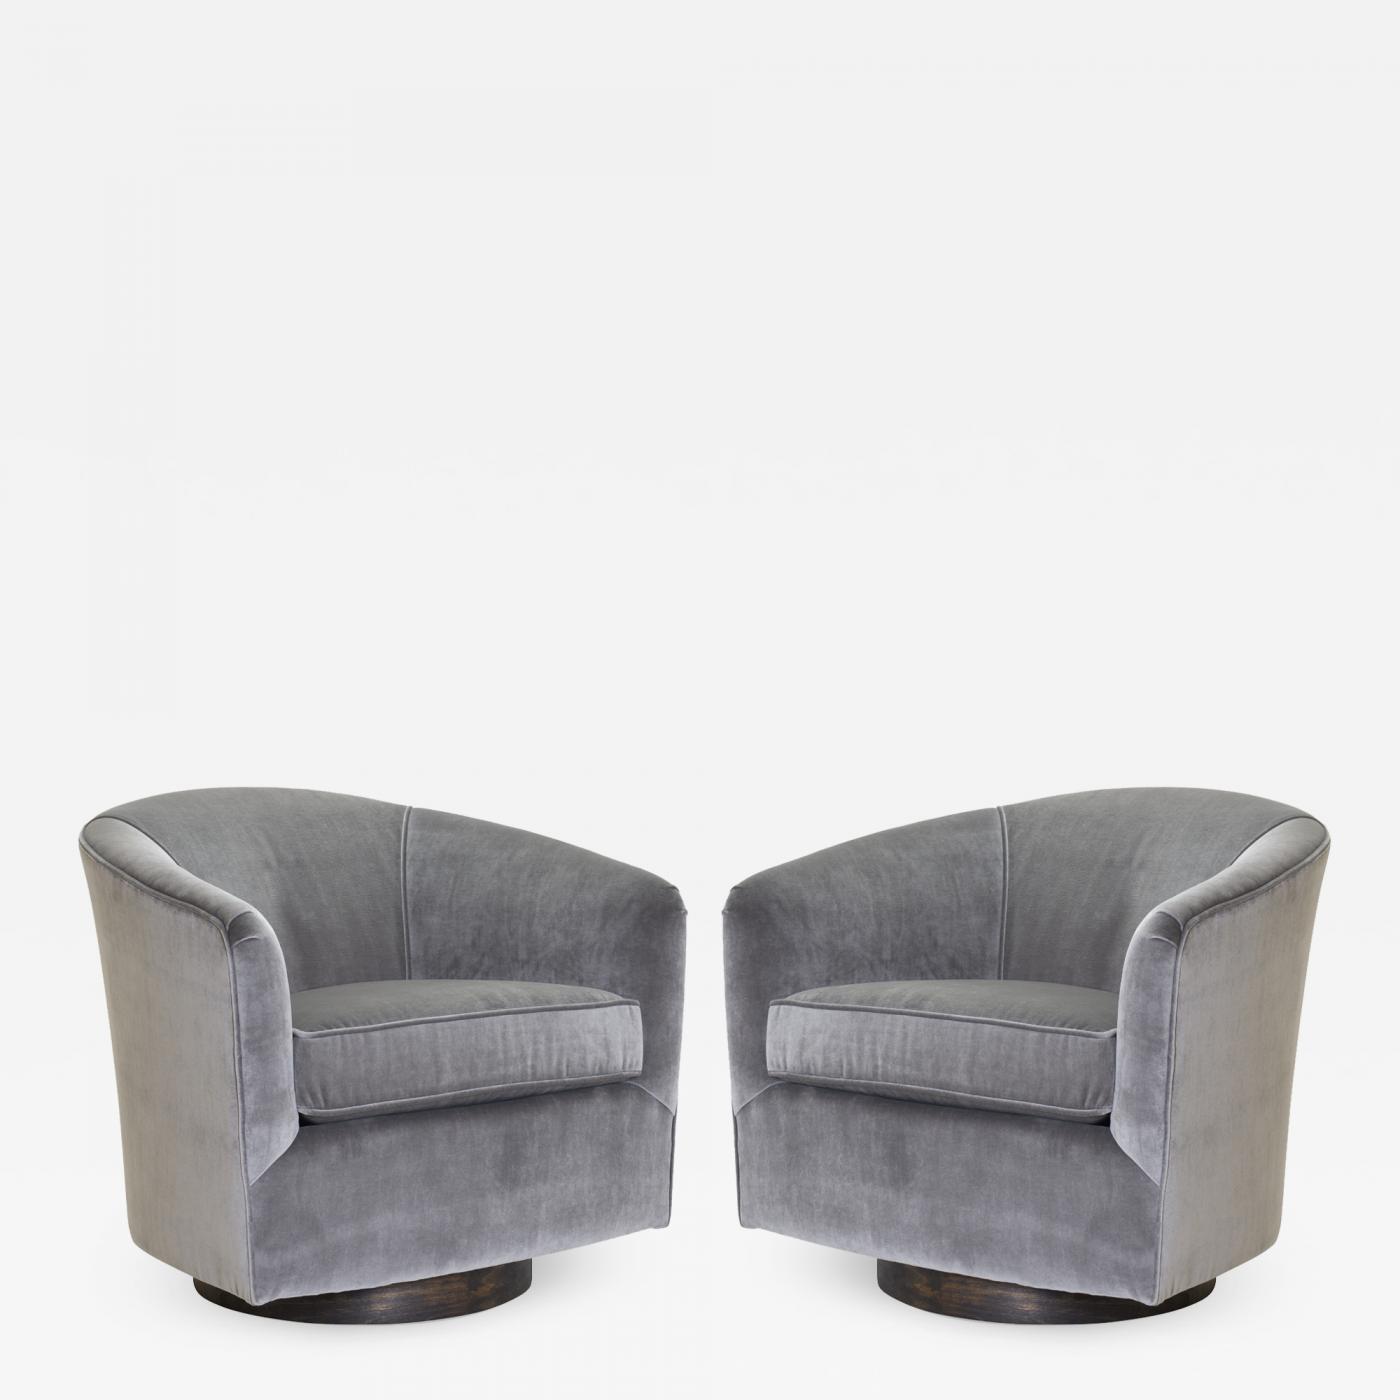 Pleasant Swivel Tub Chairs In Fog Velvet Walnut Bases Pair Camellatalisay Diy Chair Ideas Camellatalisaycom